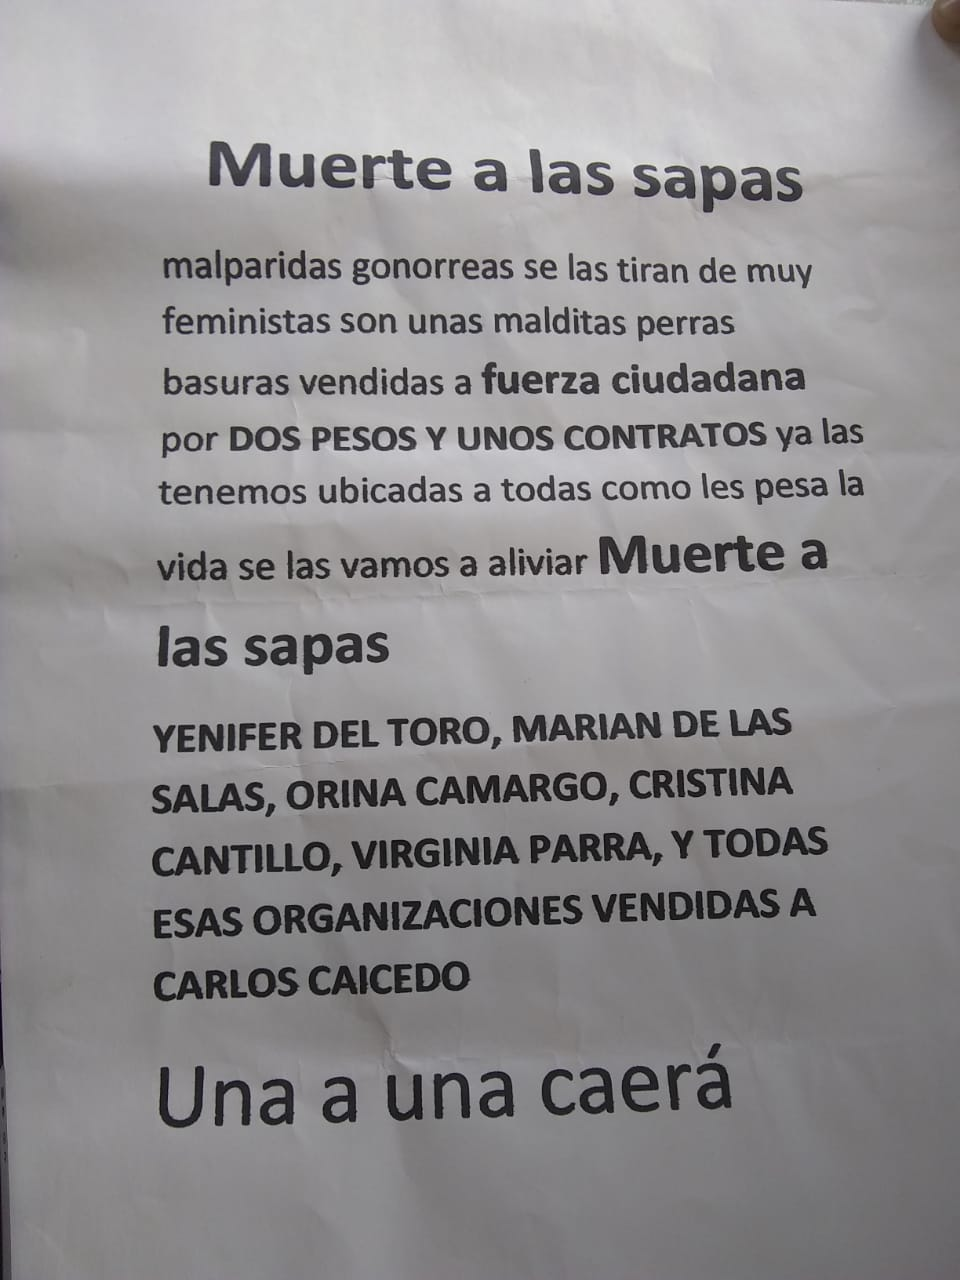 Panfleto que amenazas a colectivo de mujeres.